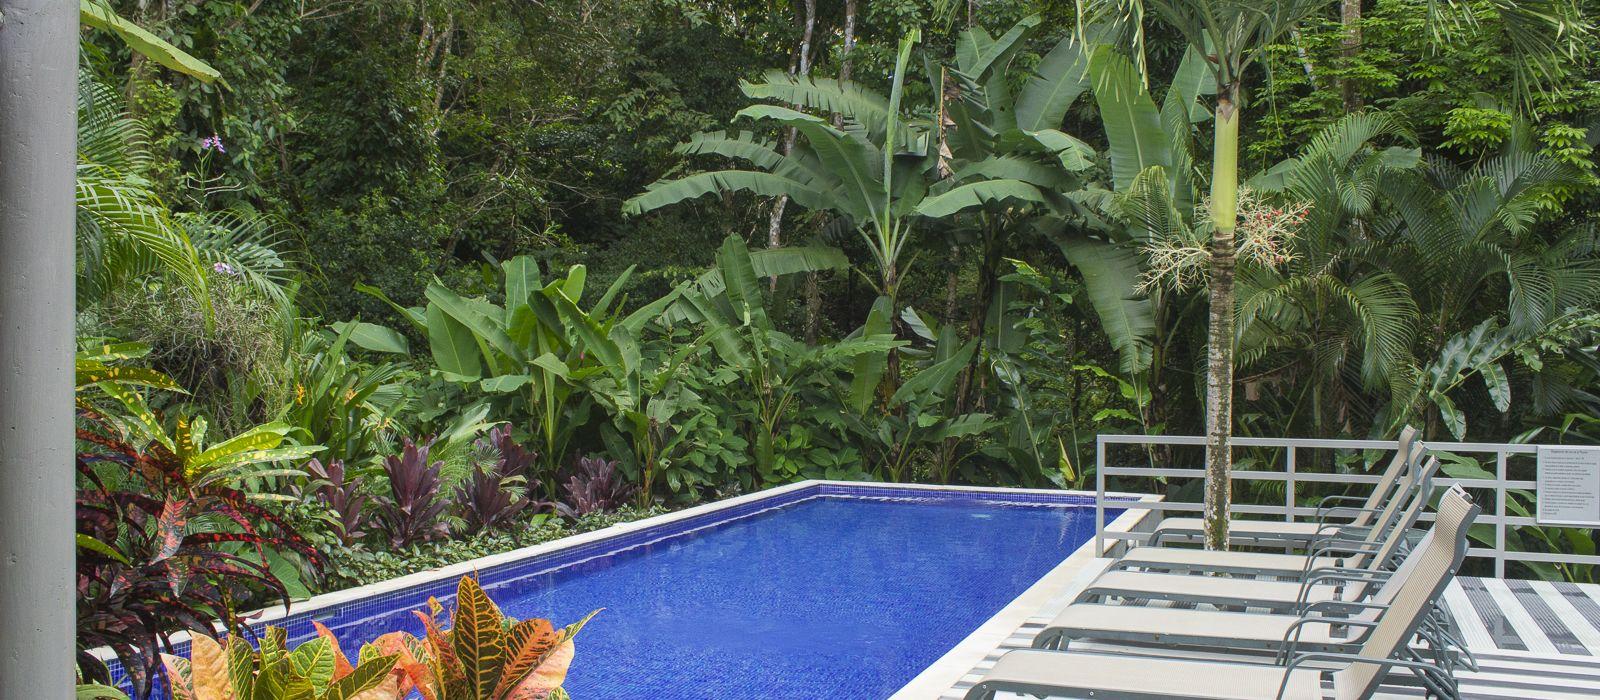 Hotel Plaza Yara Costa Rica